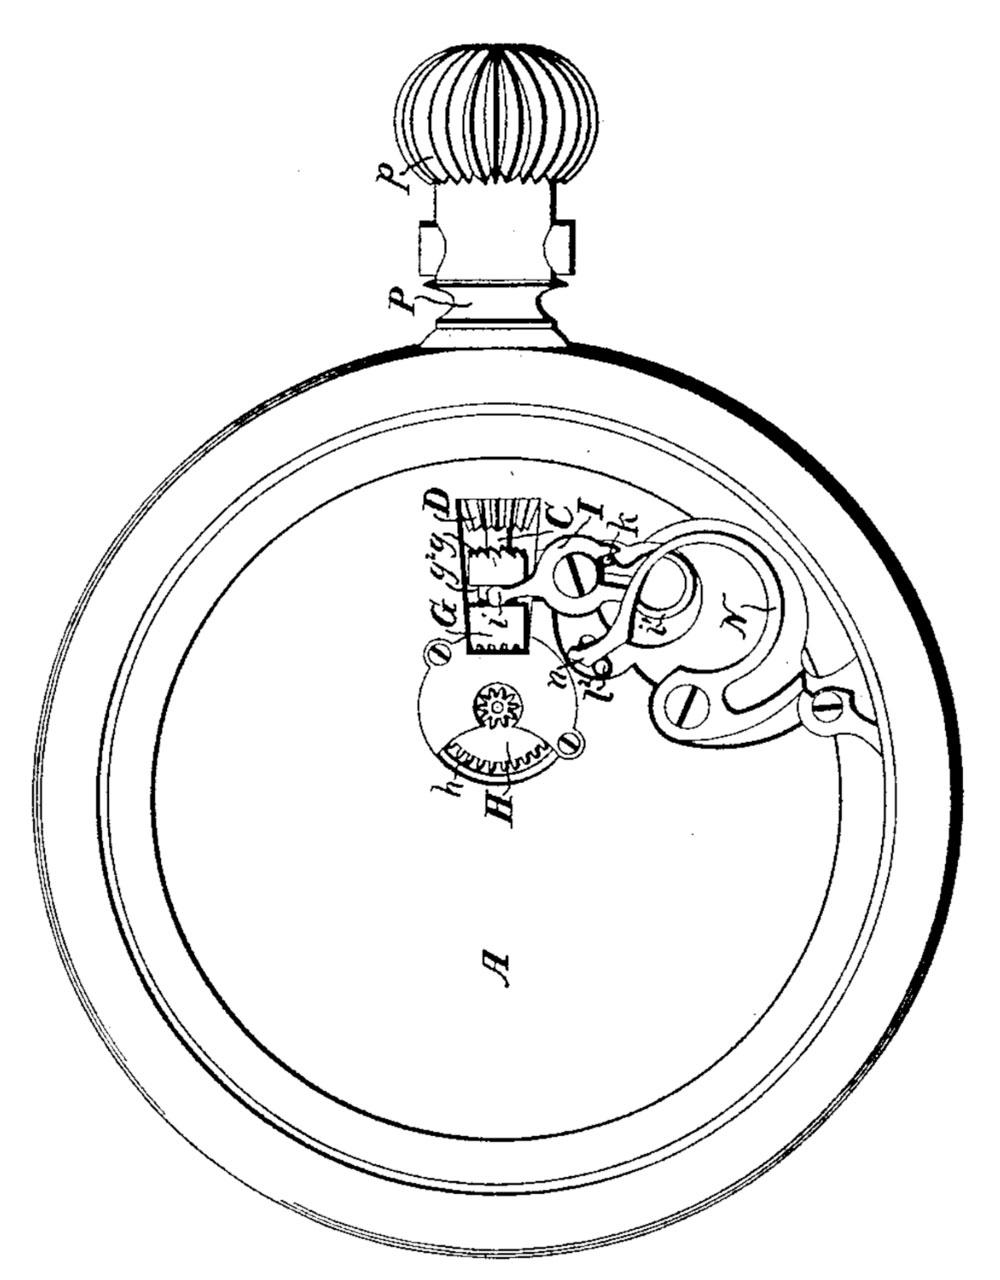 Elgin National Watch Co. Grade 248 Technical Docs